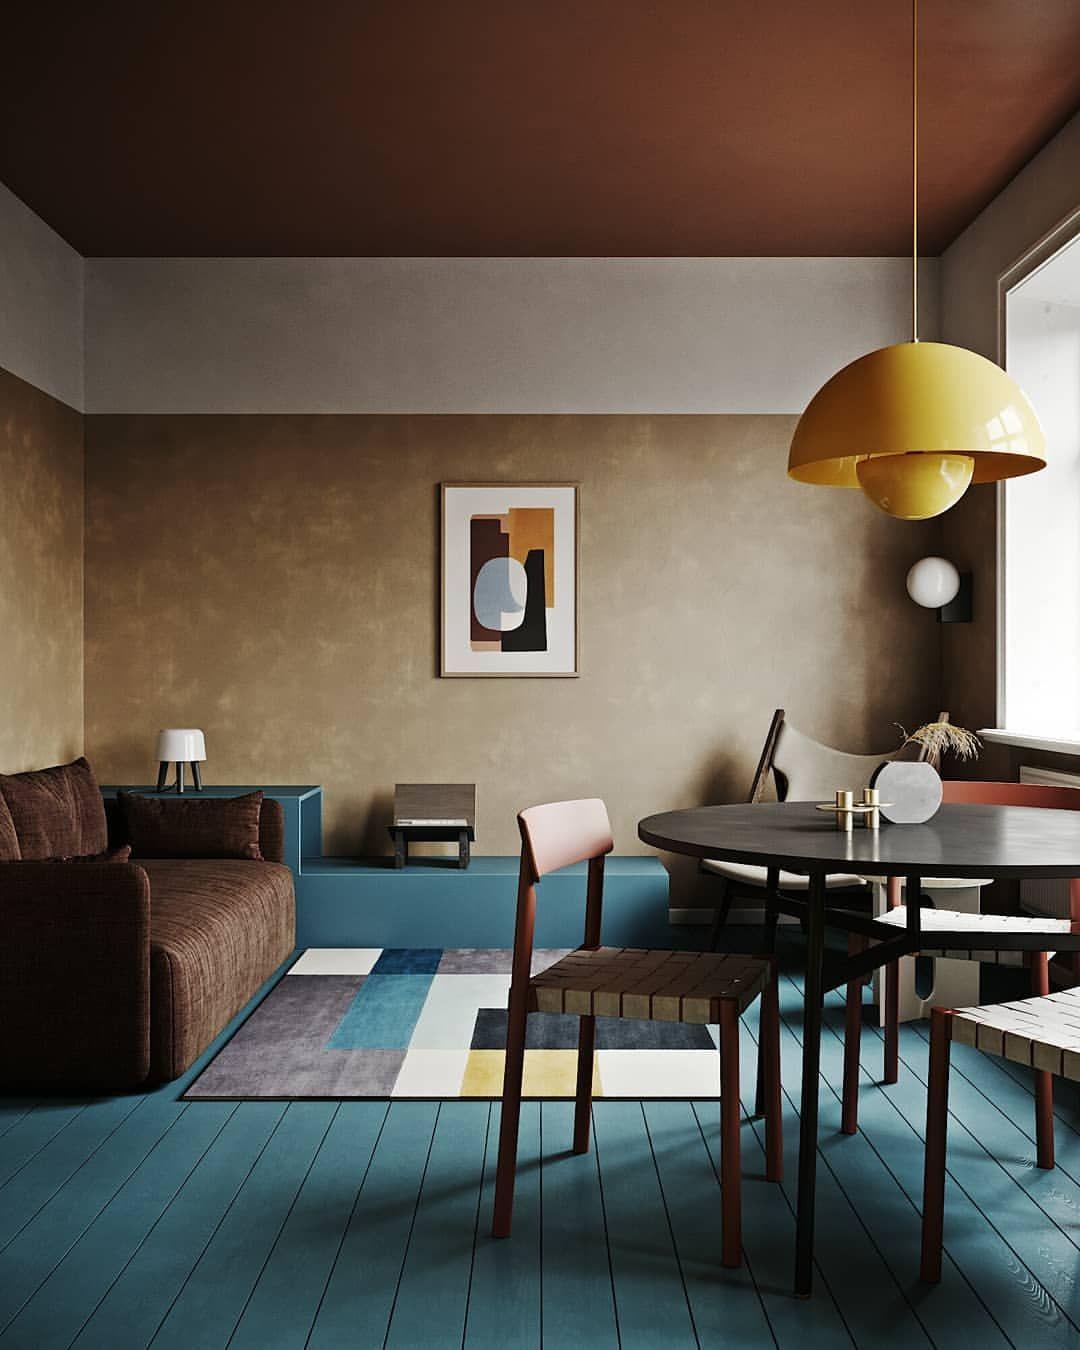 "3d Room Interior Design: 3d Visualizer 在 Instagram 上发布:""The Second View"